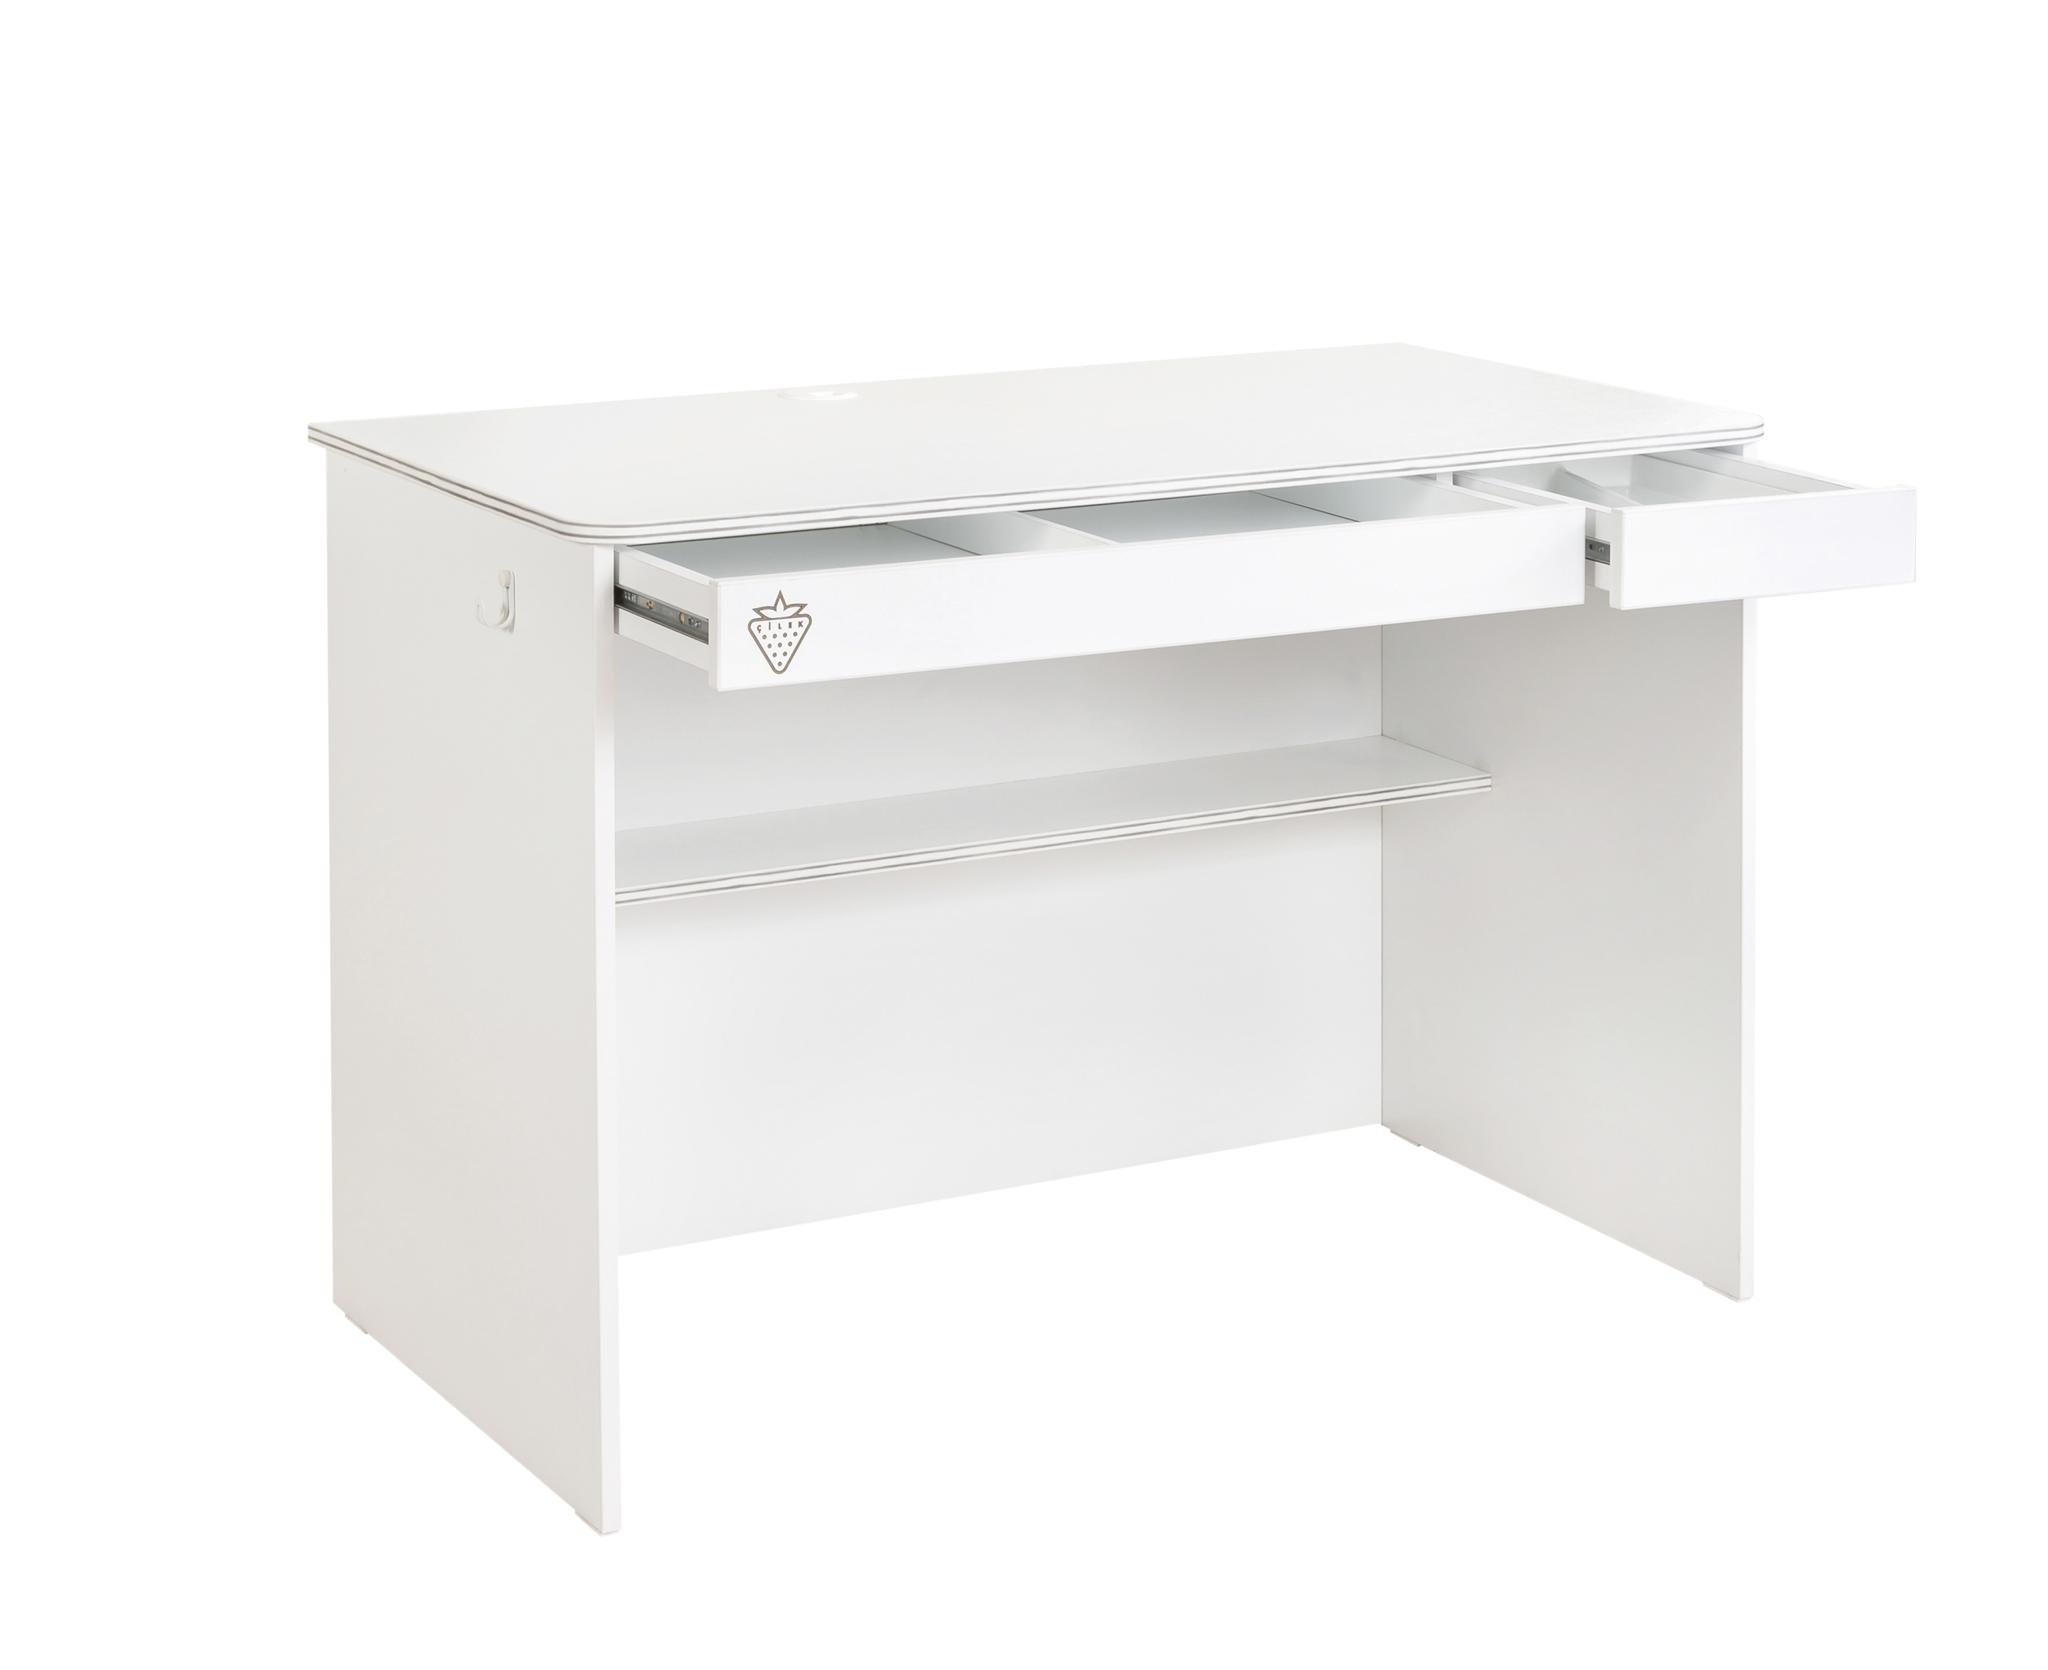 Masa de birou din pal cu 2 sertare pentru tineret White Small, L113xl59xH75 cm imagine